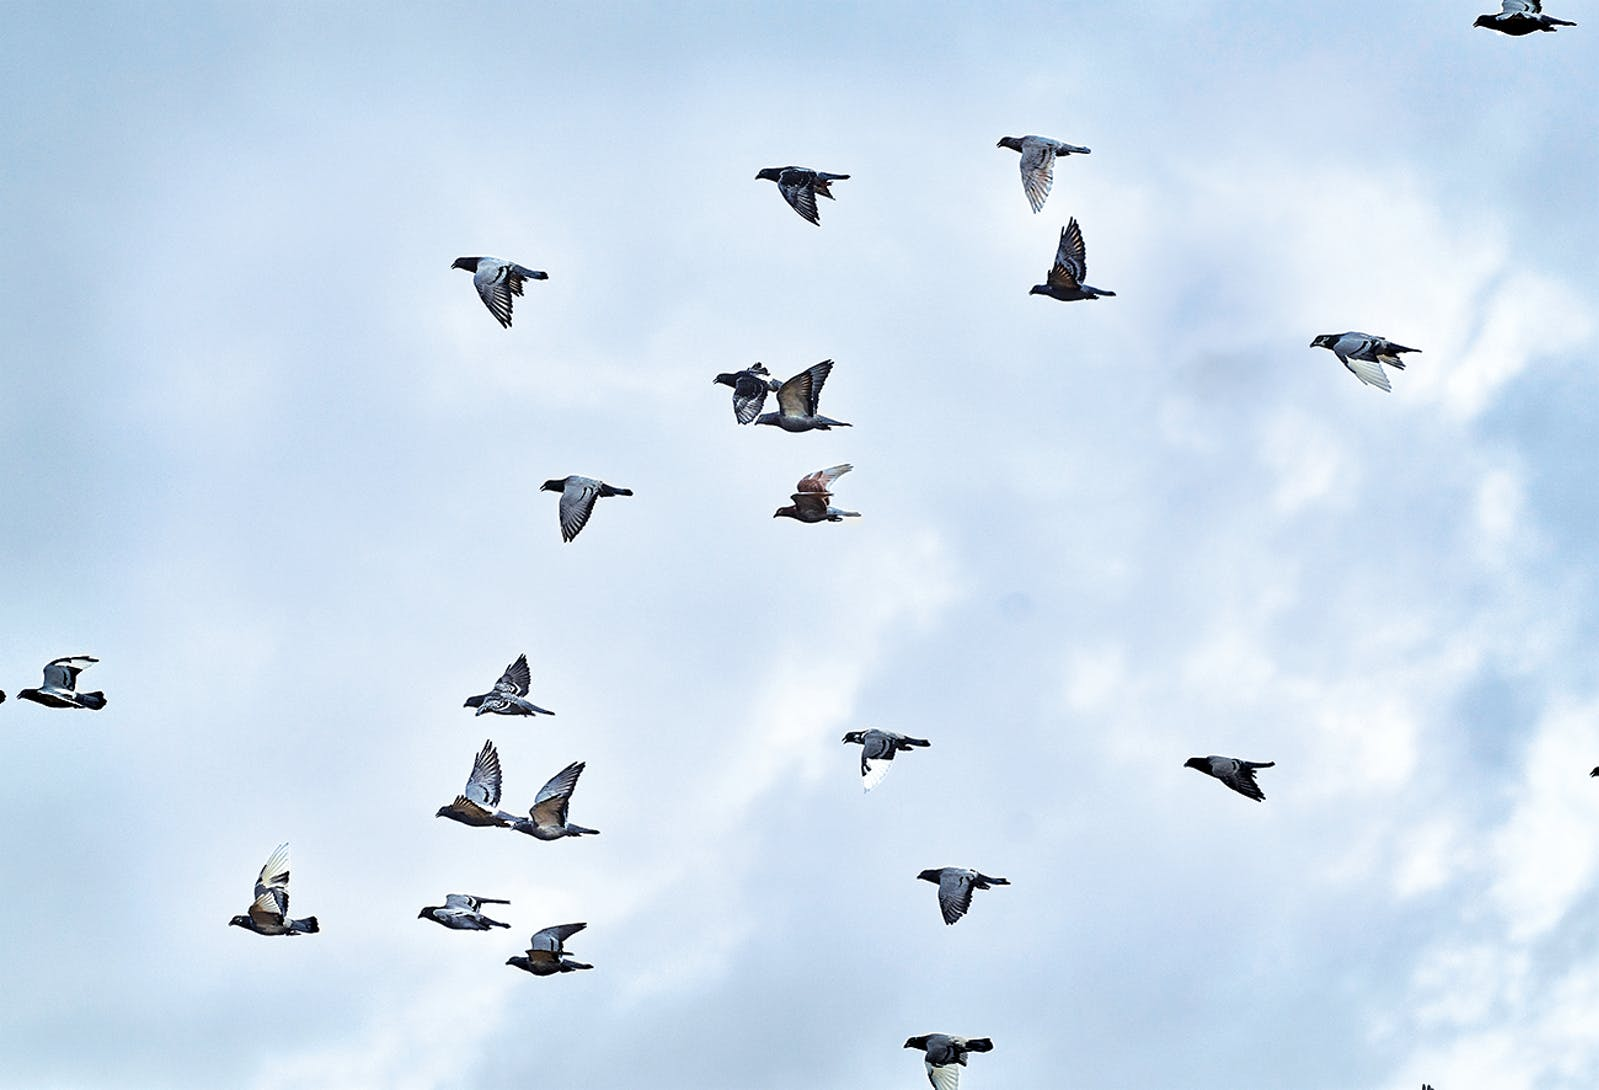 Homing pigeons flying